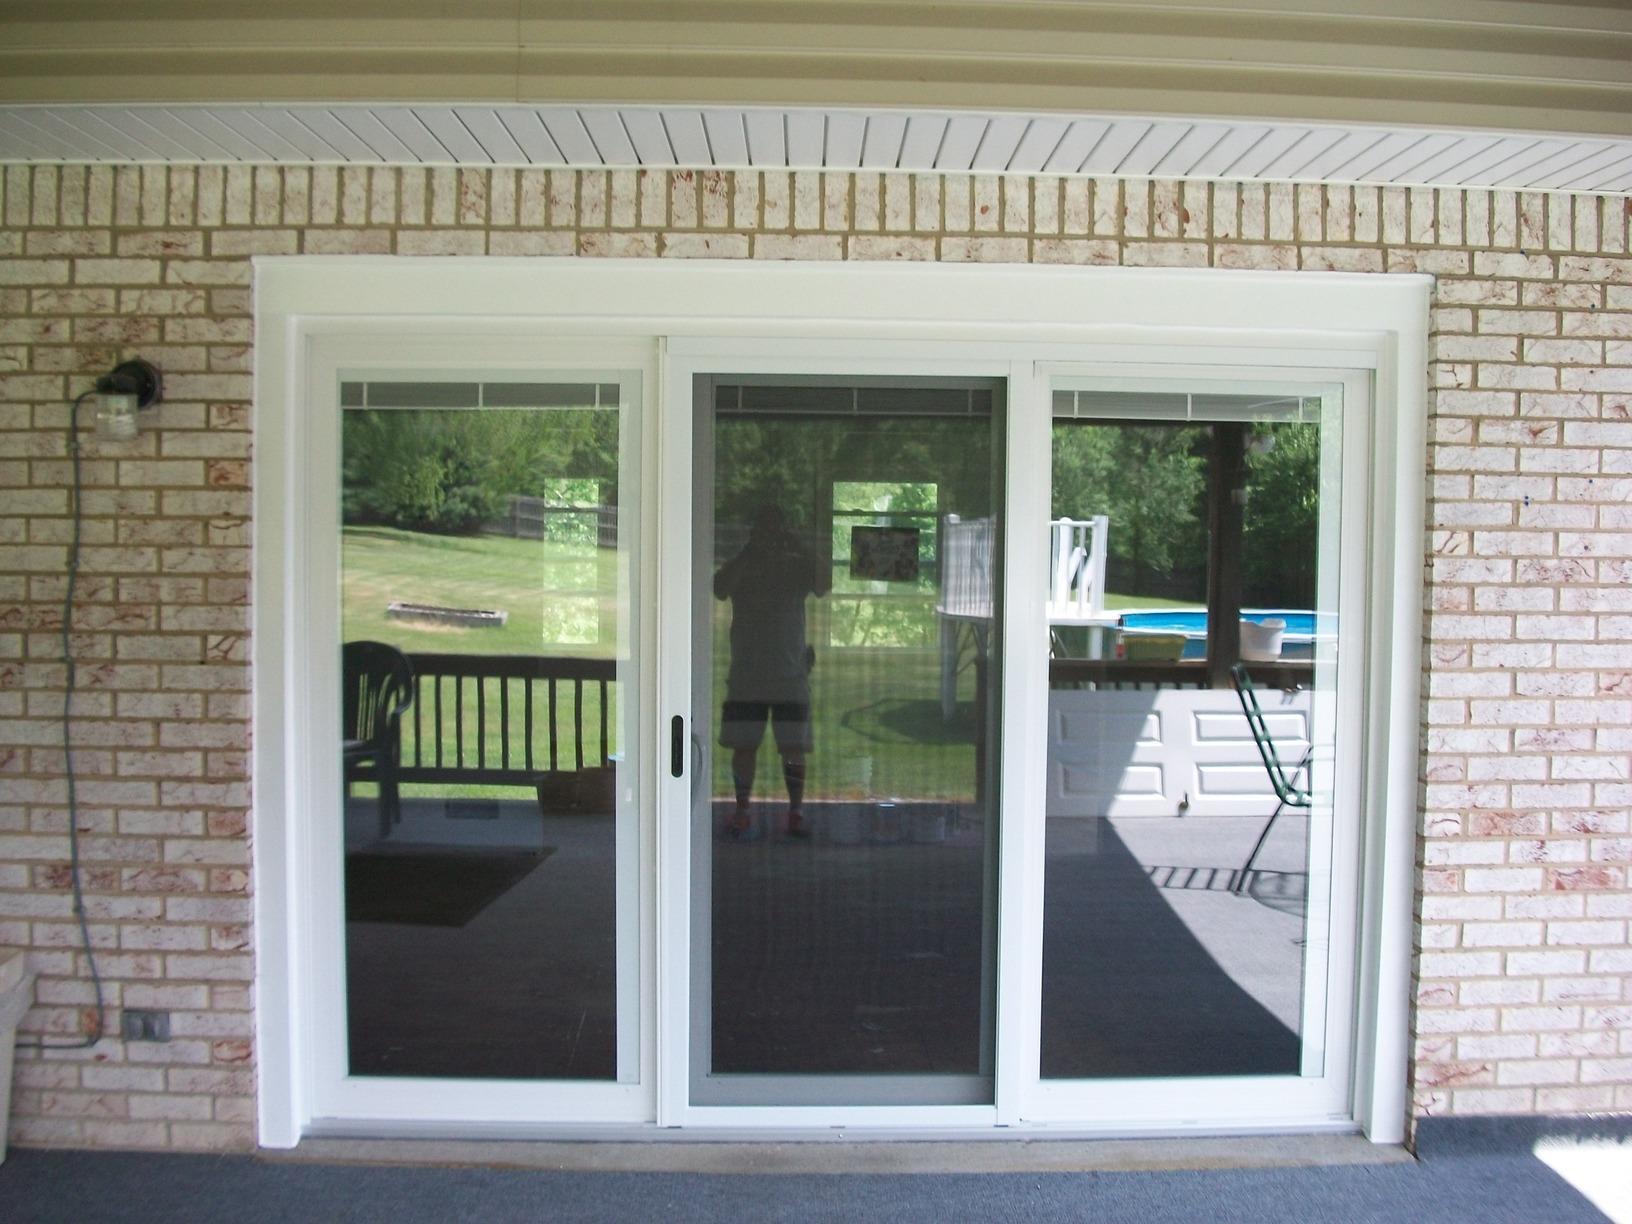 Energy Swing Windows - Replacement Doors - Three panel ...